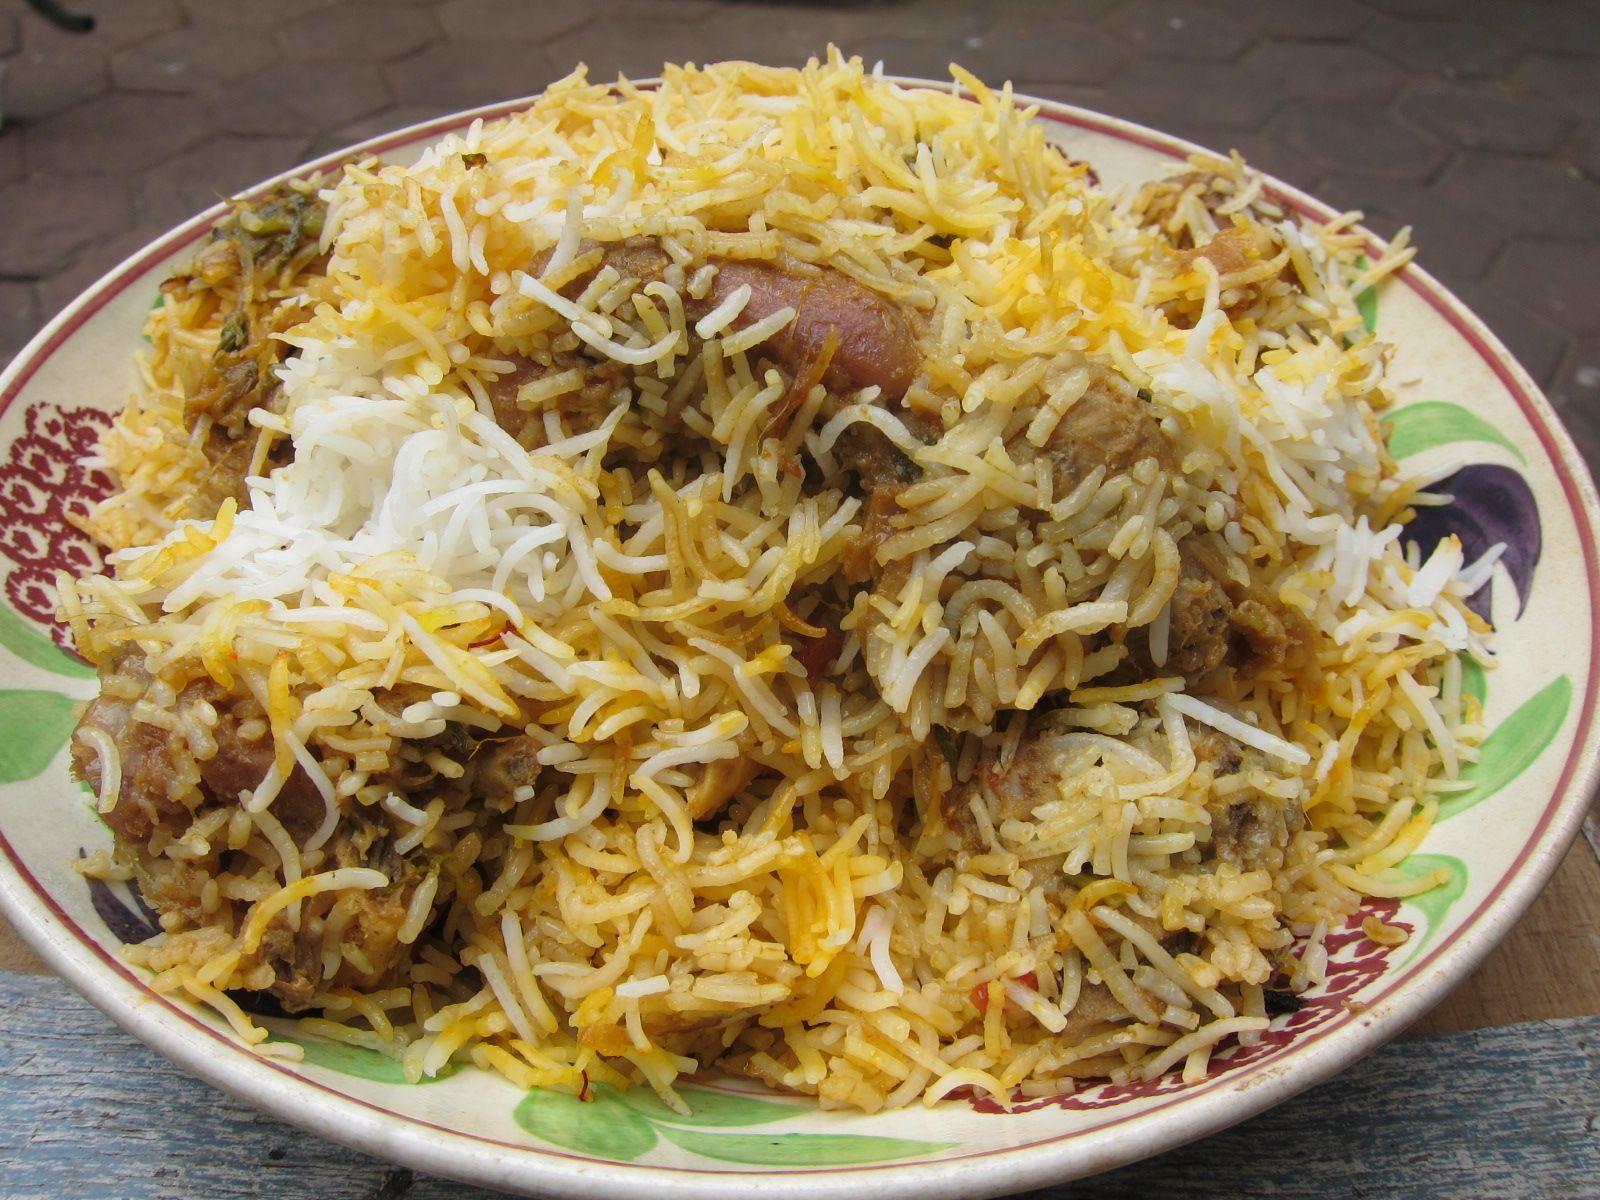 Food recipes by chef somu hyderabadi kacha ghost ki biryani food recipes by chef somu hyderabadi kacha ghost ki biryani forumfinder Choice Image